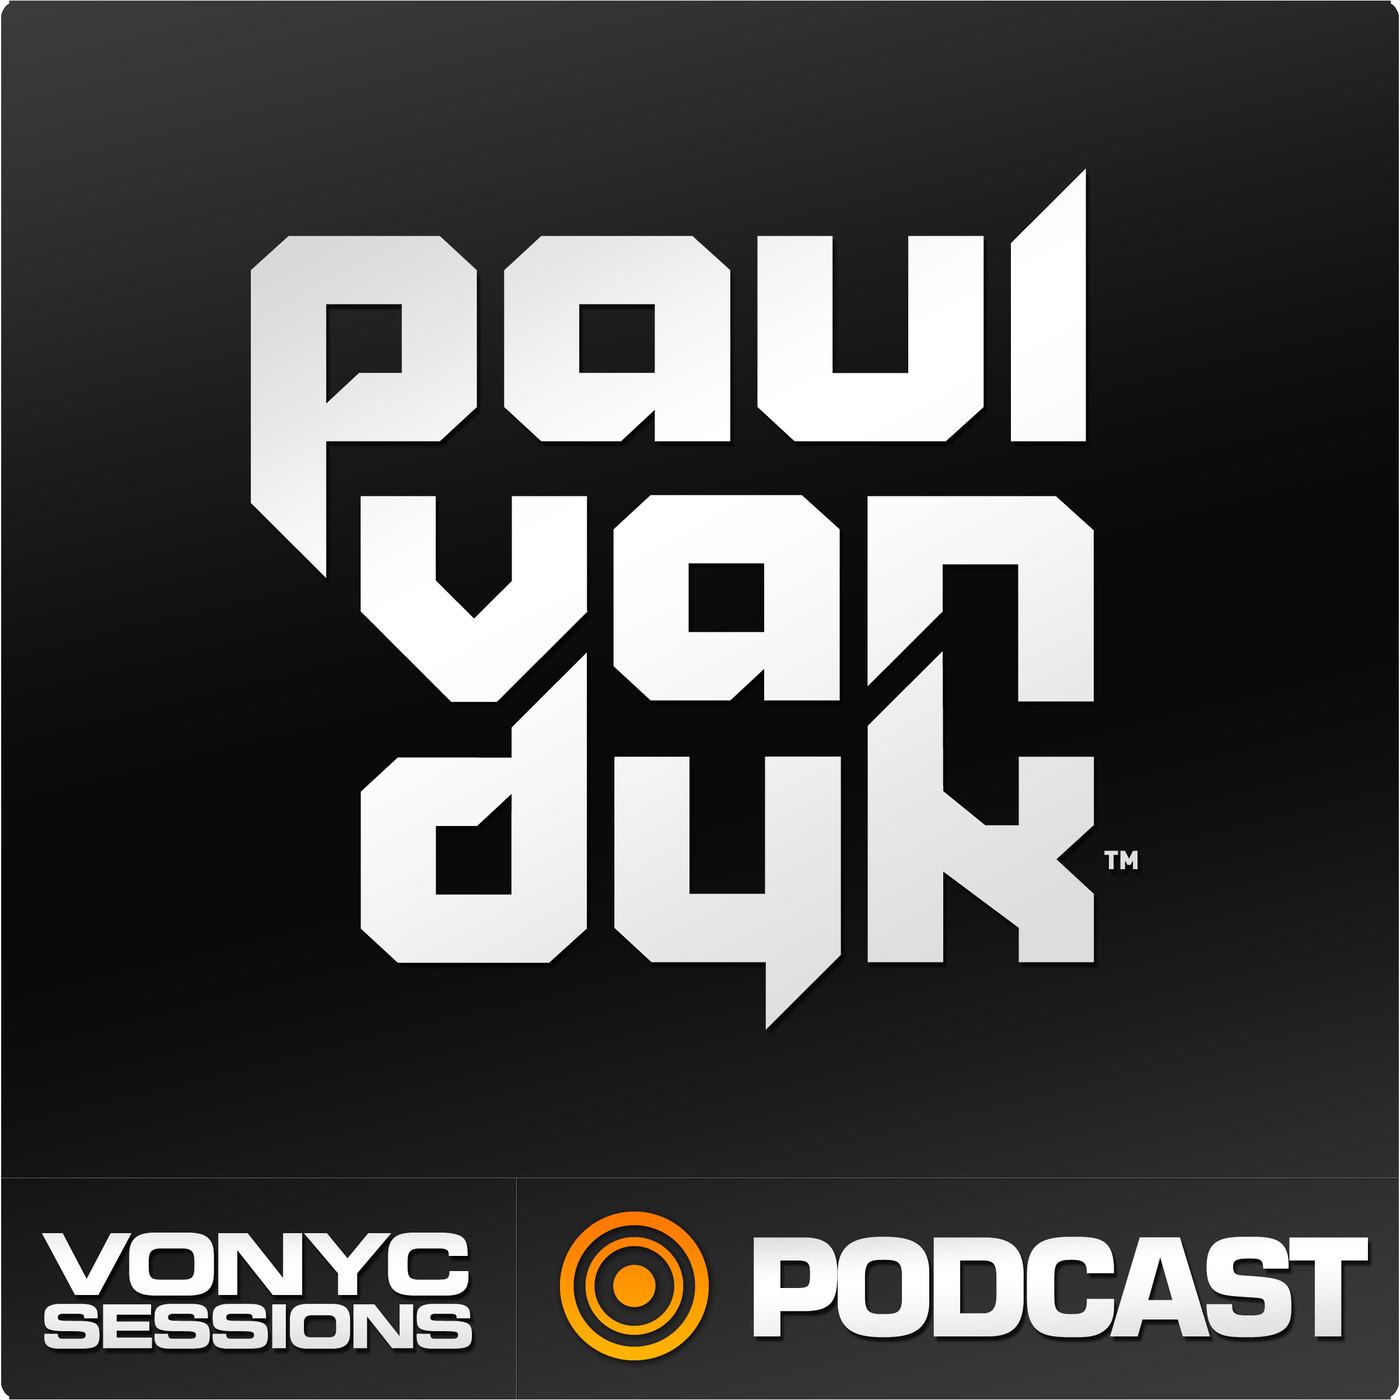 Paul van Dyk's VONYC Sessions Episode 724